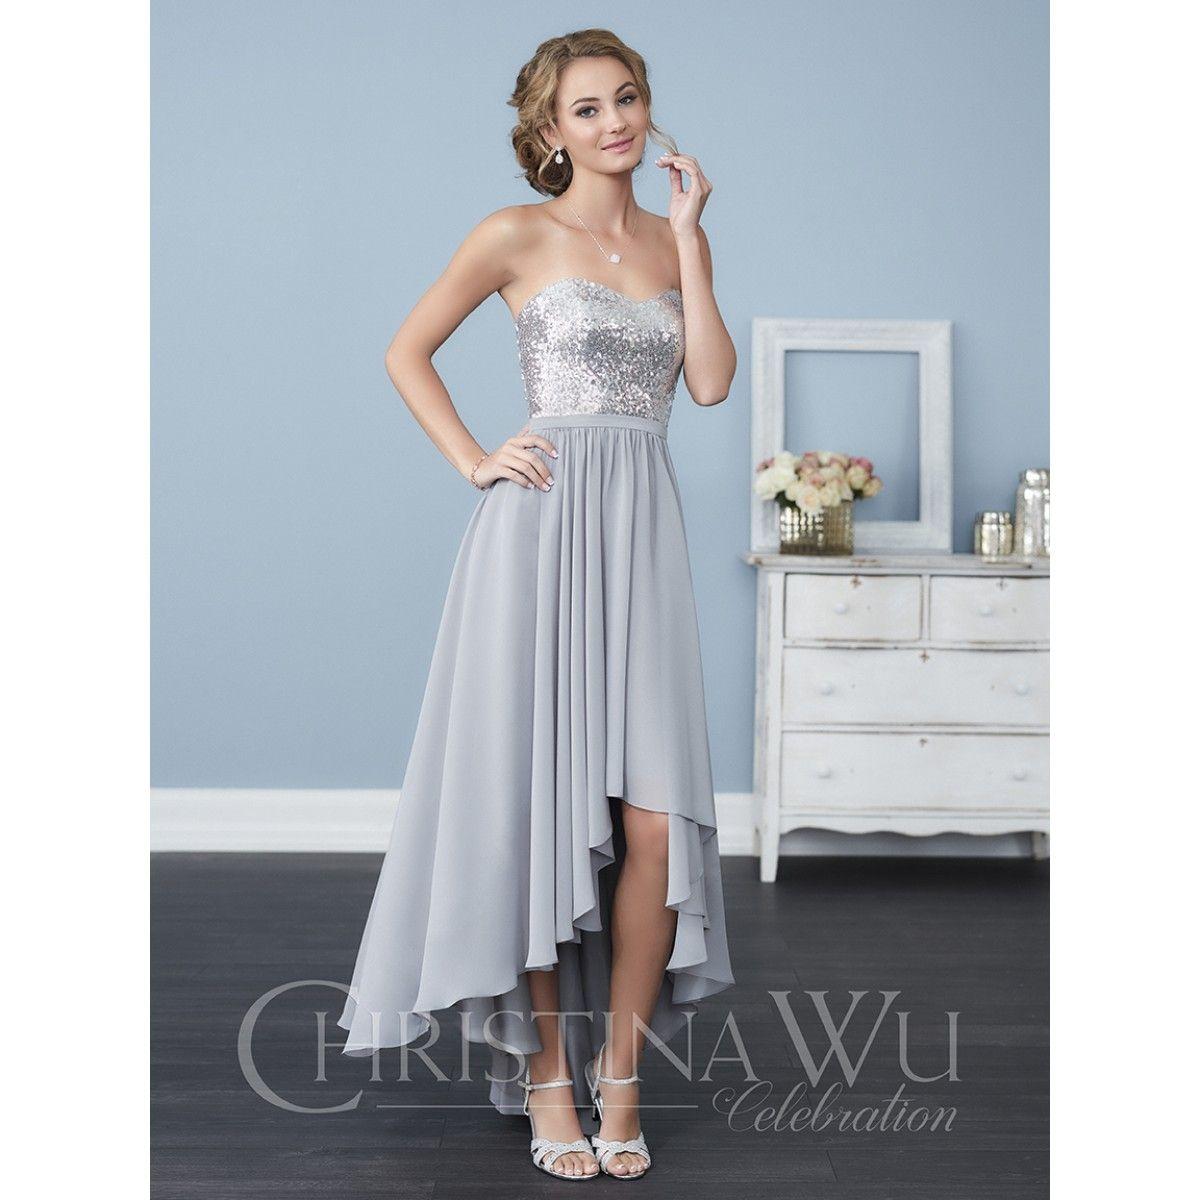 Bridesmaid Dress Available at Ella Park Bridal   Newburgh, IN ...